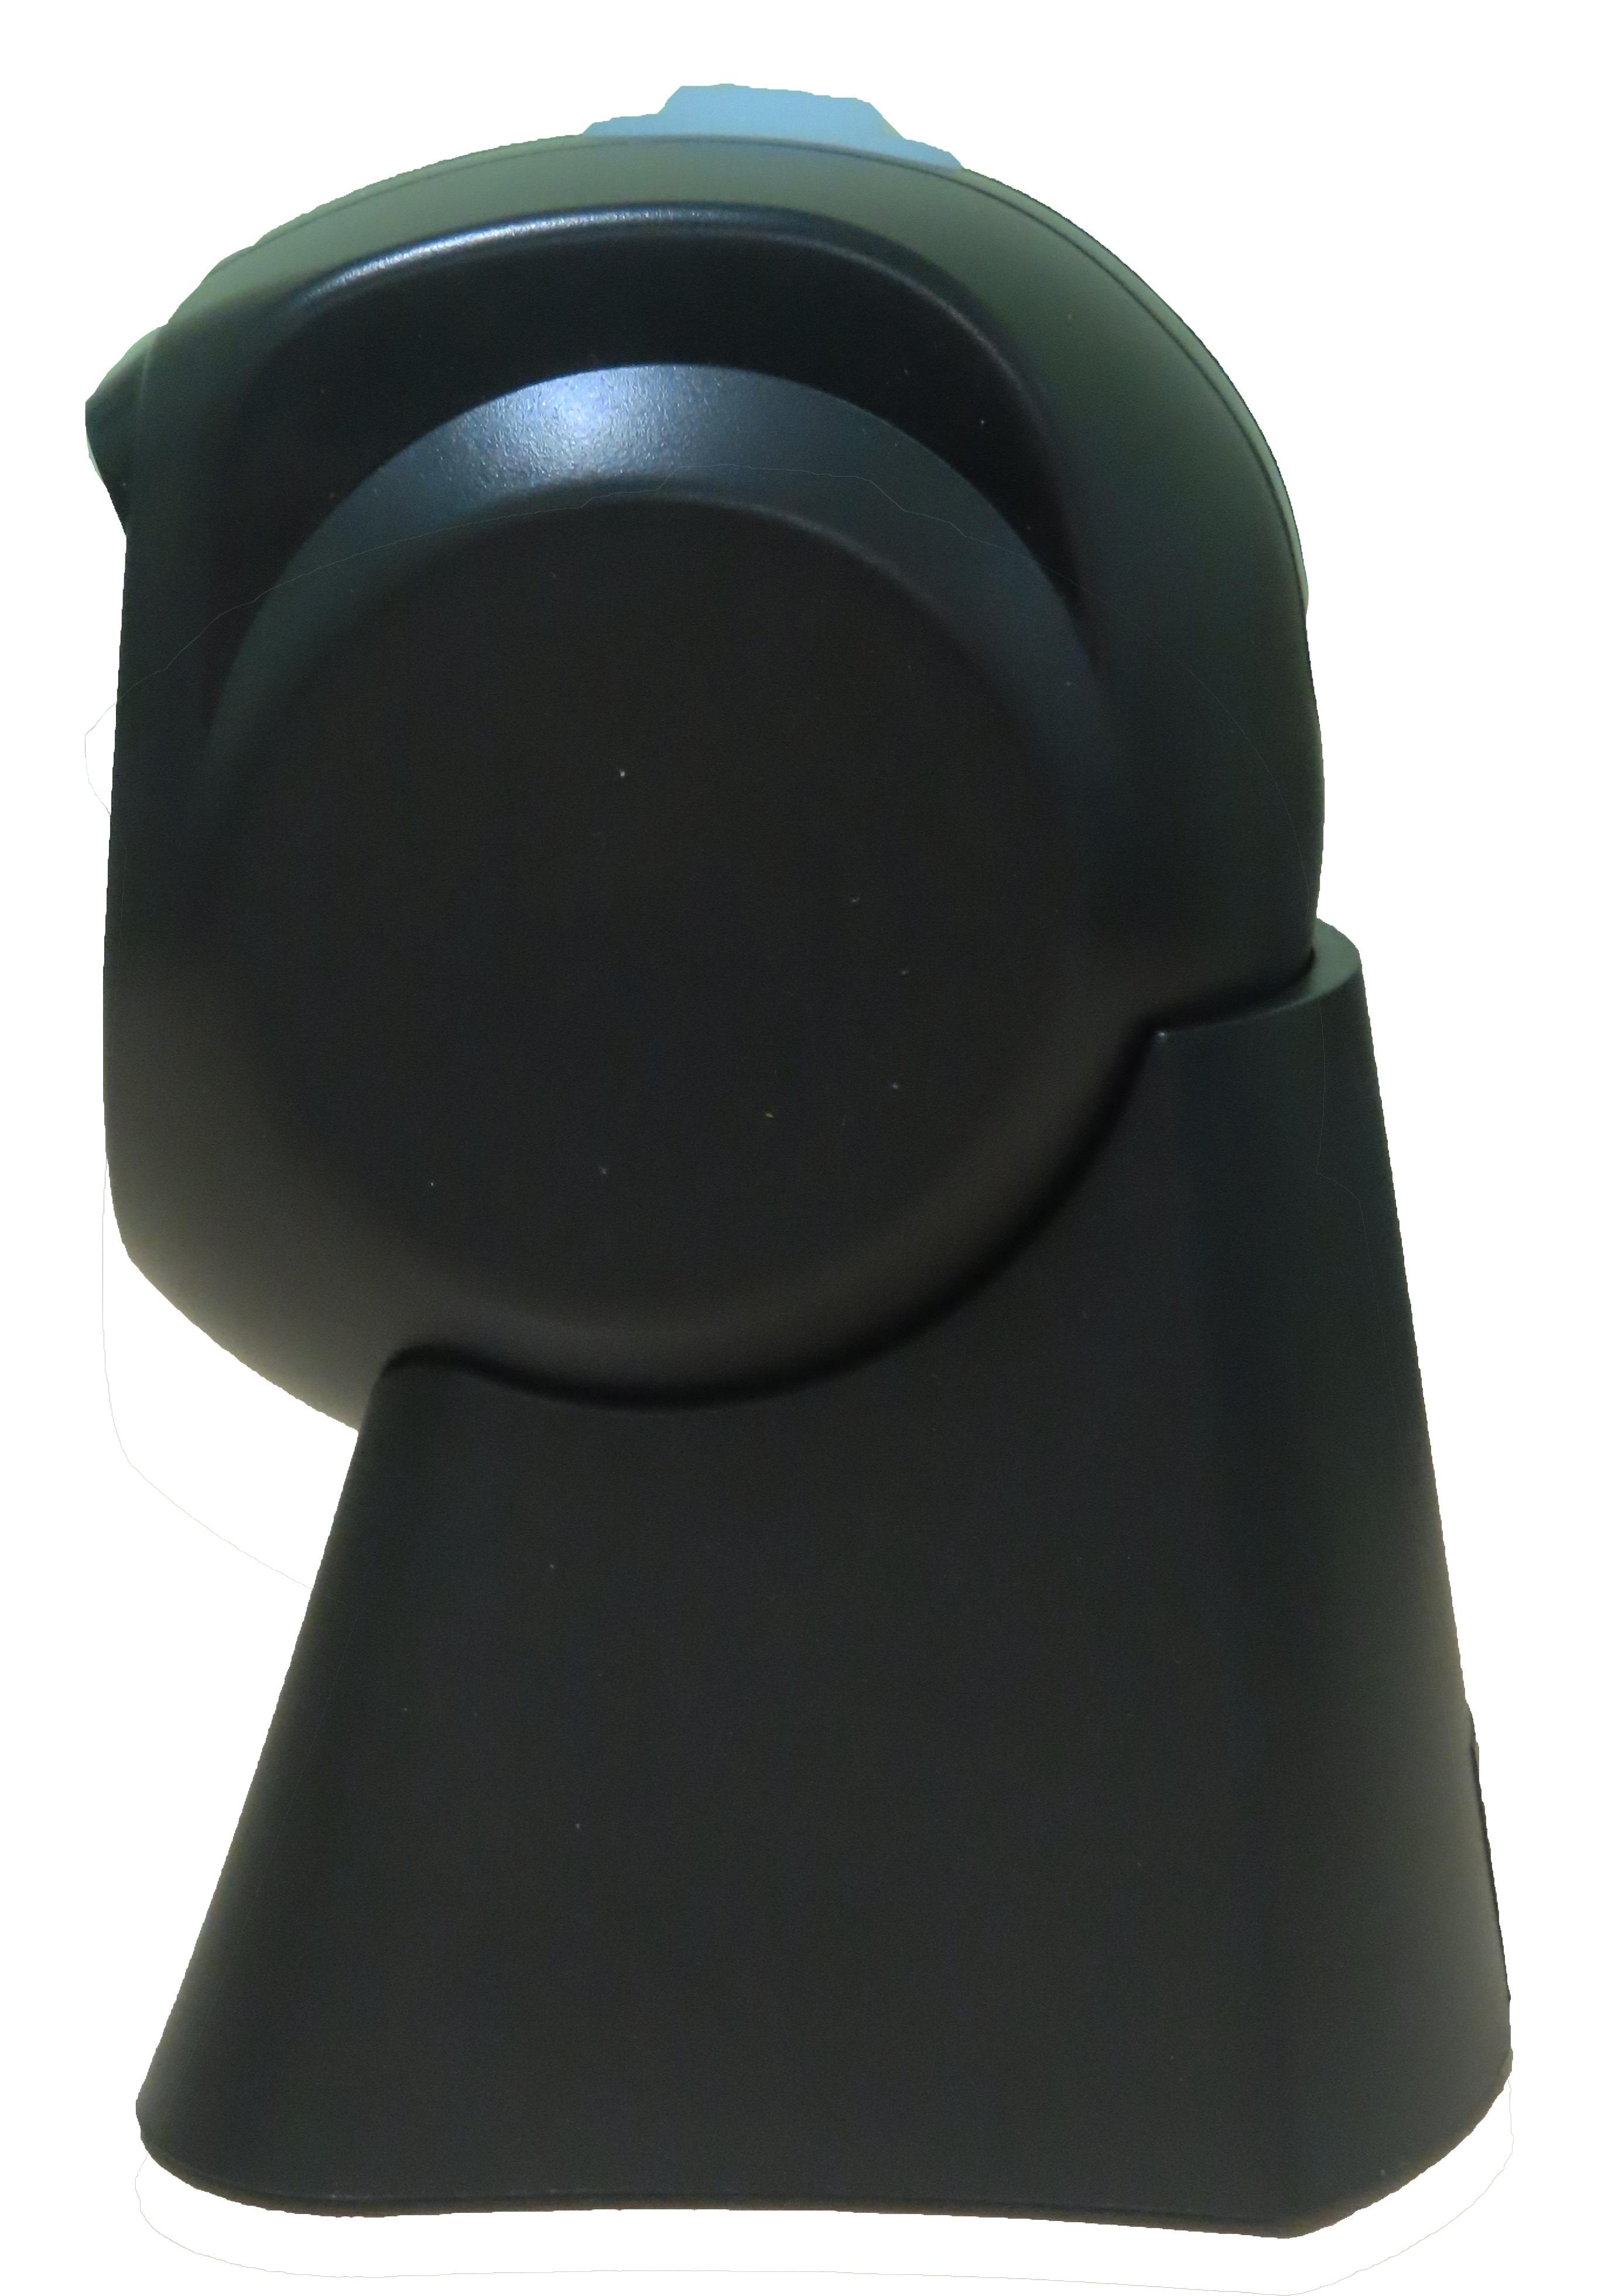 Gt 7120 Desktop 2d Barcode Scanner